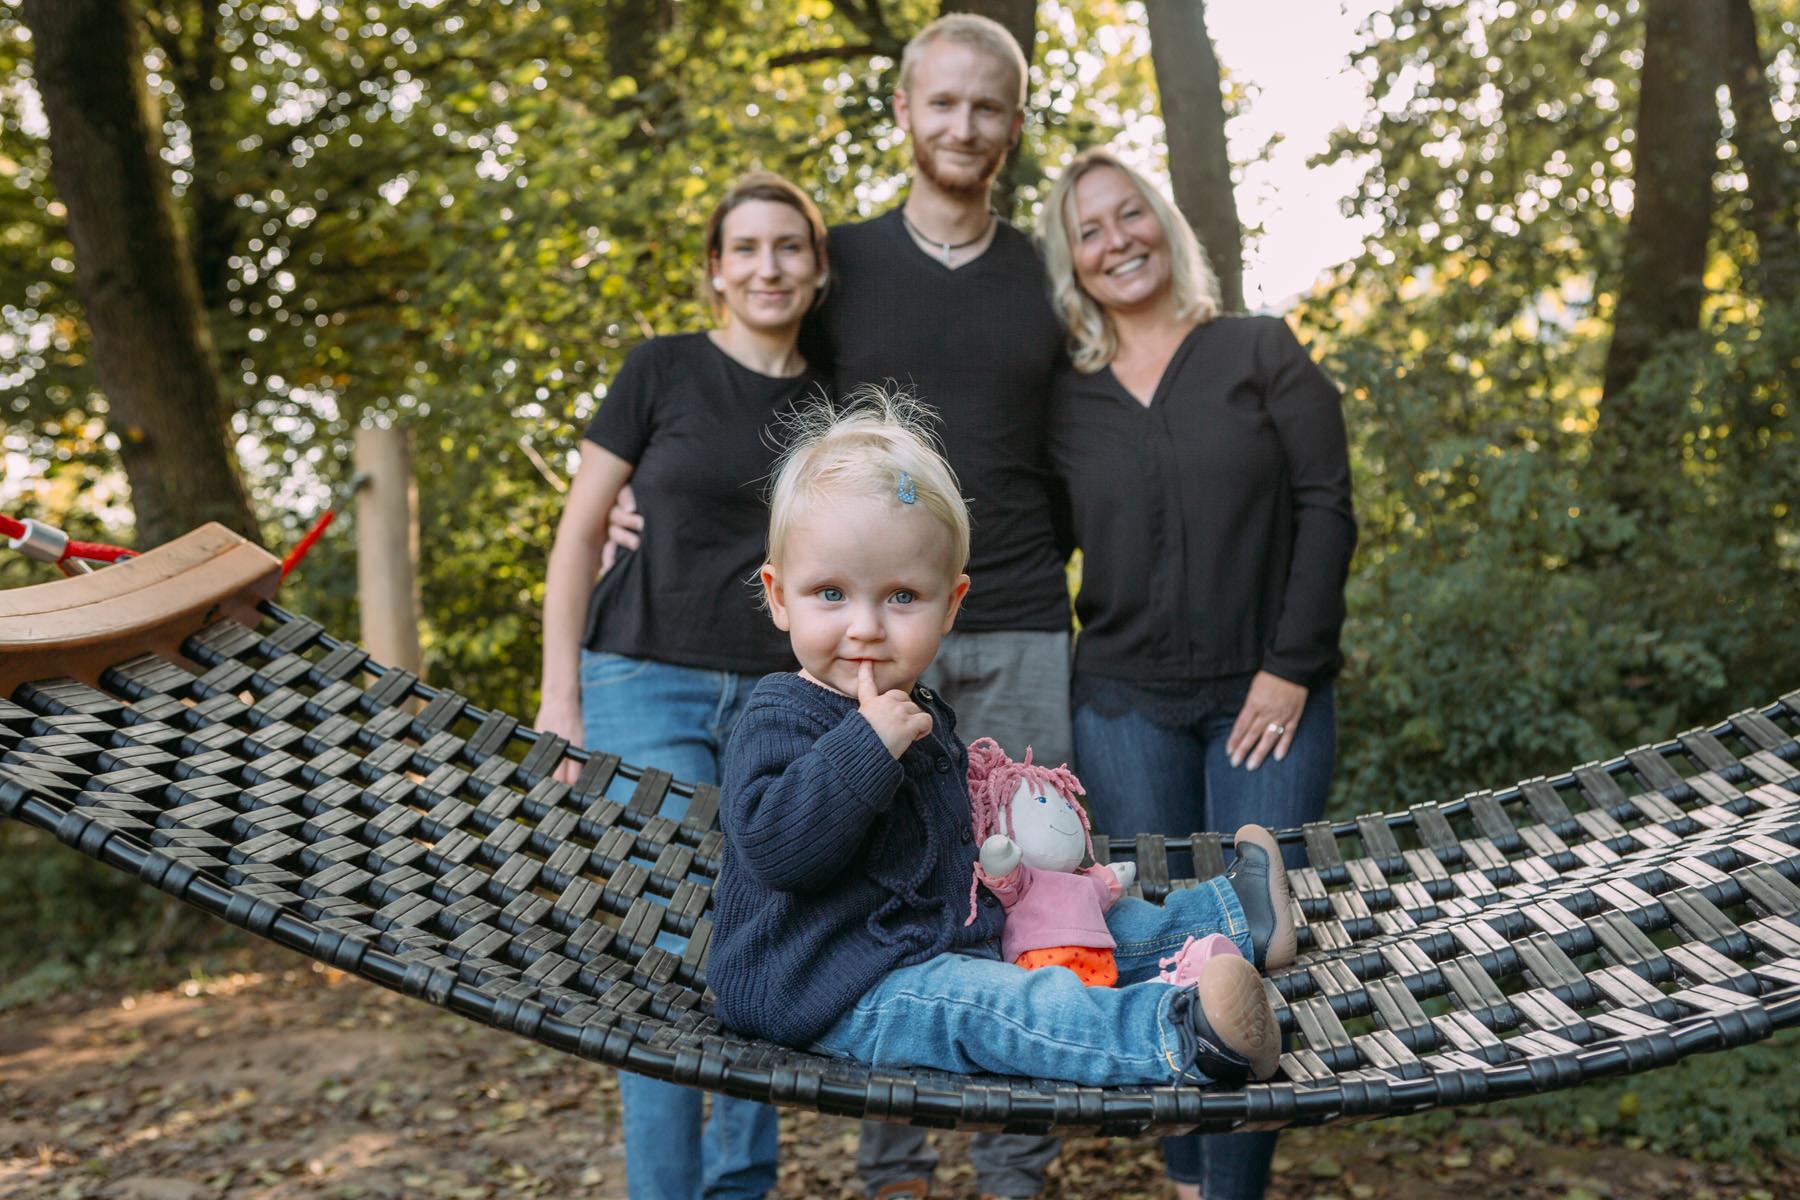 Familienbilder Odenwald - Familienfotos Odenwald - Familienshooting im Kurpark Bad König